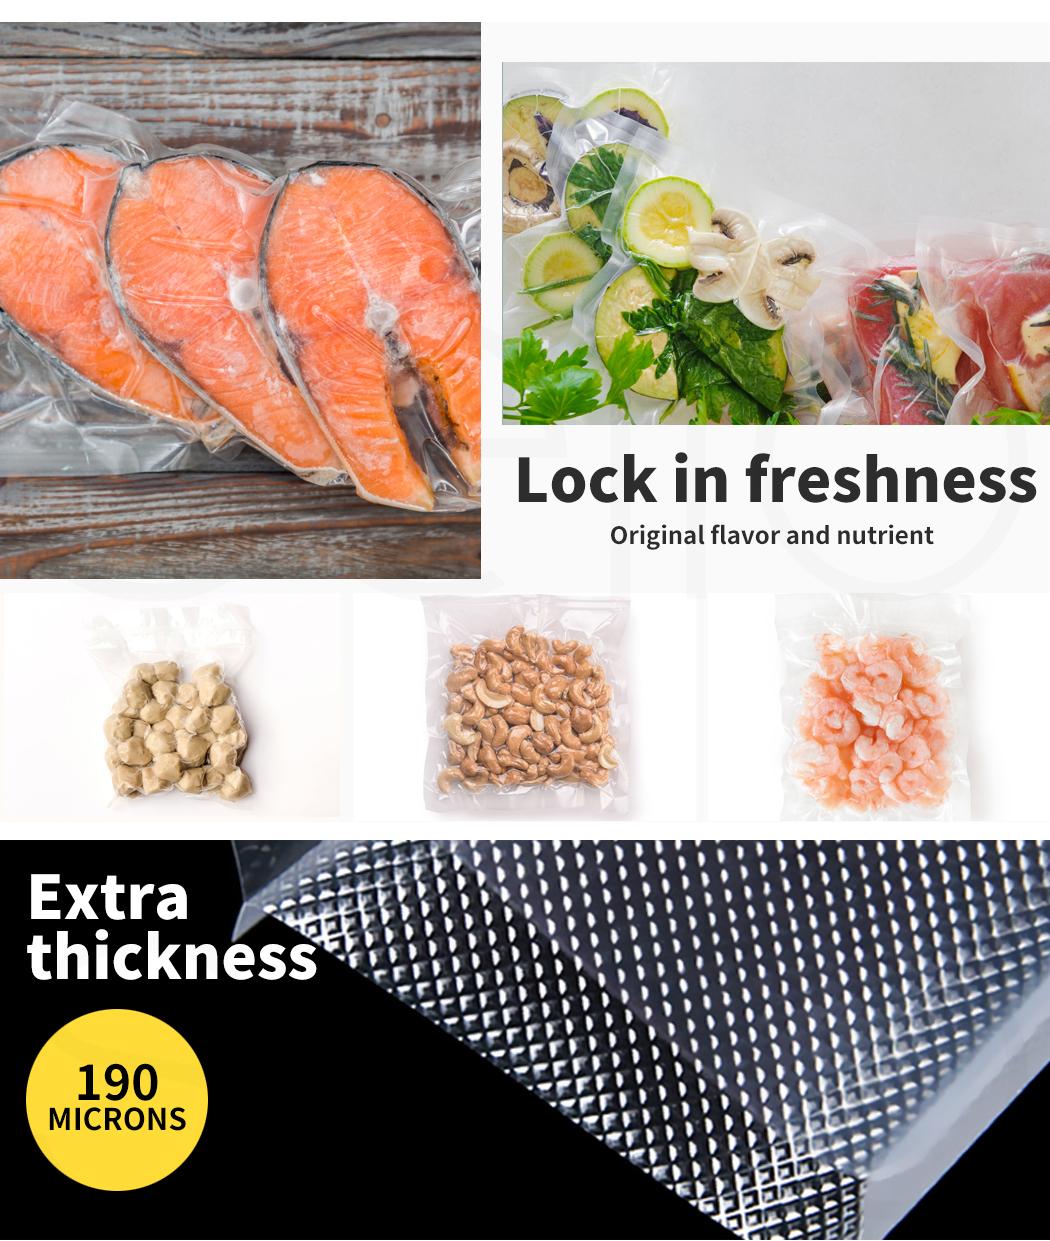 thumbnail 137 - Vacuum Food Sealer Storage Bags Saver Seal Bags Commercial Heat 100/200/500x